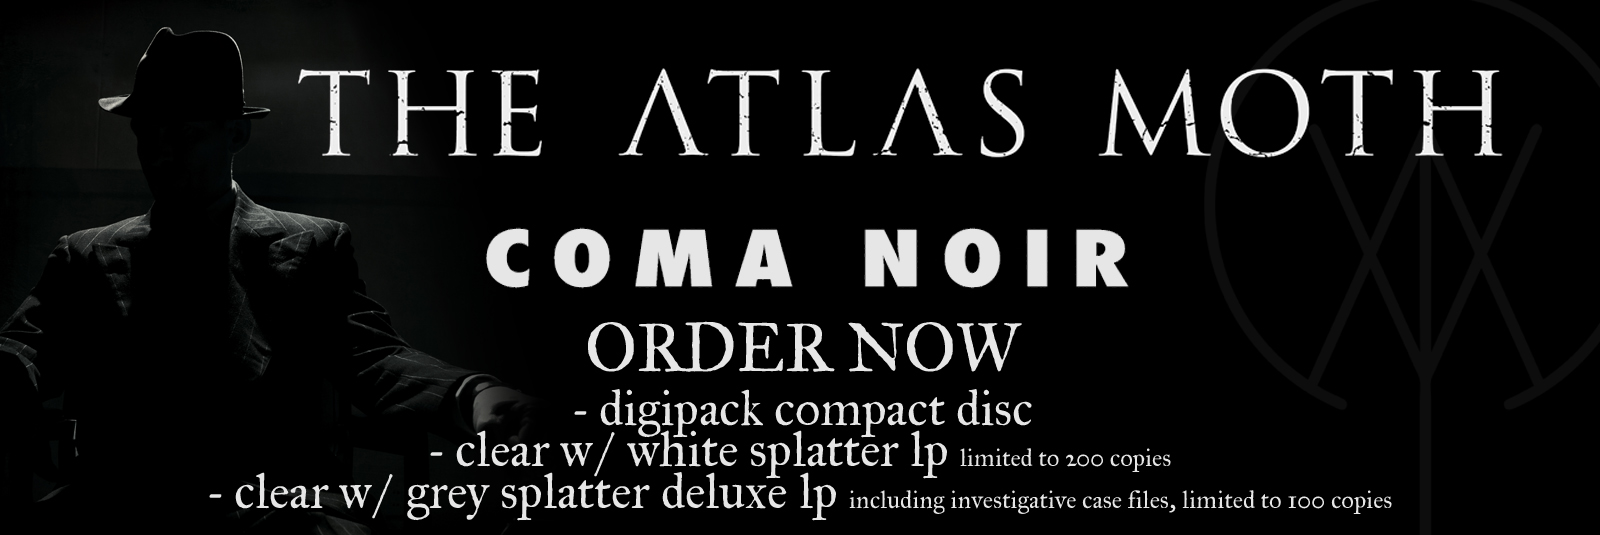 The Atlas Moth - Coma Noir out Feb. 9th 2018